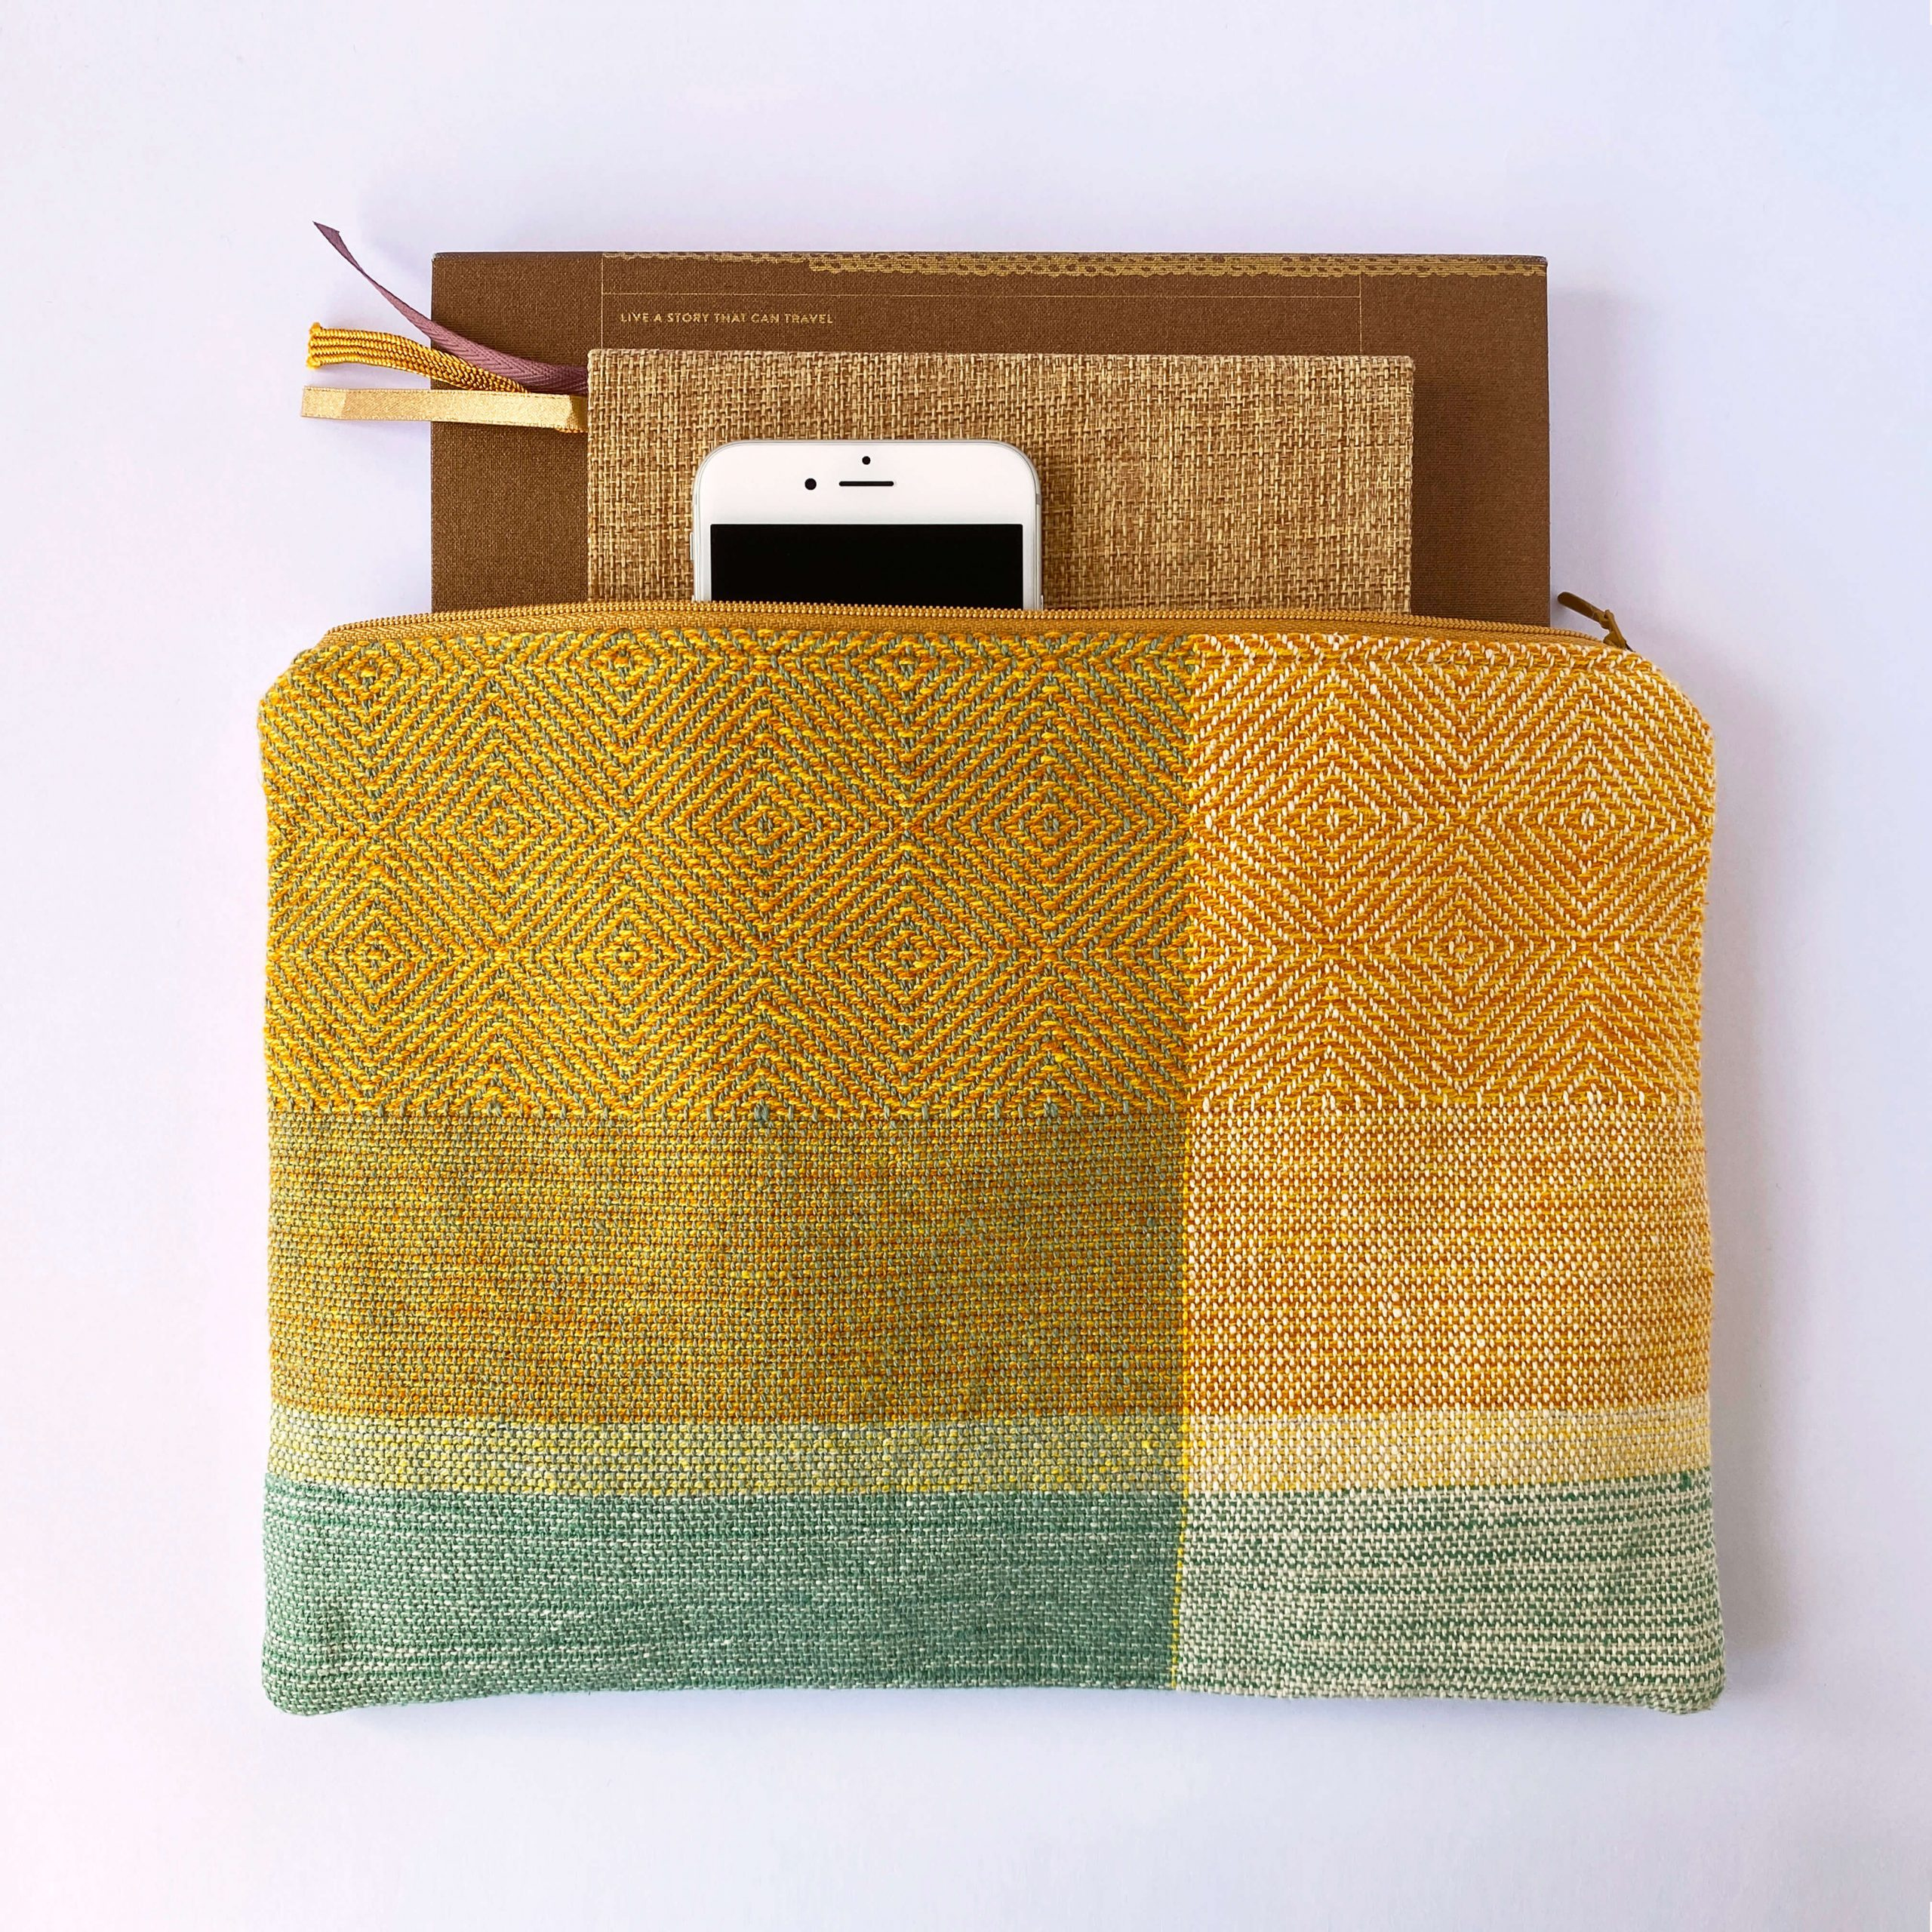 Zipperbag in point twill & plain weave (11ZB)